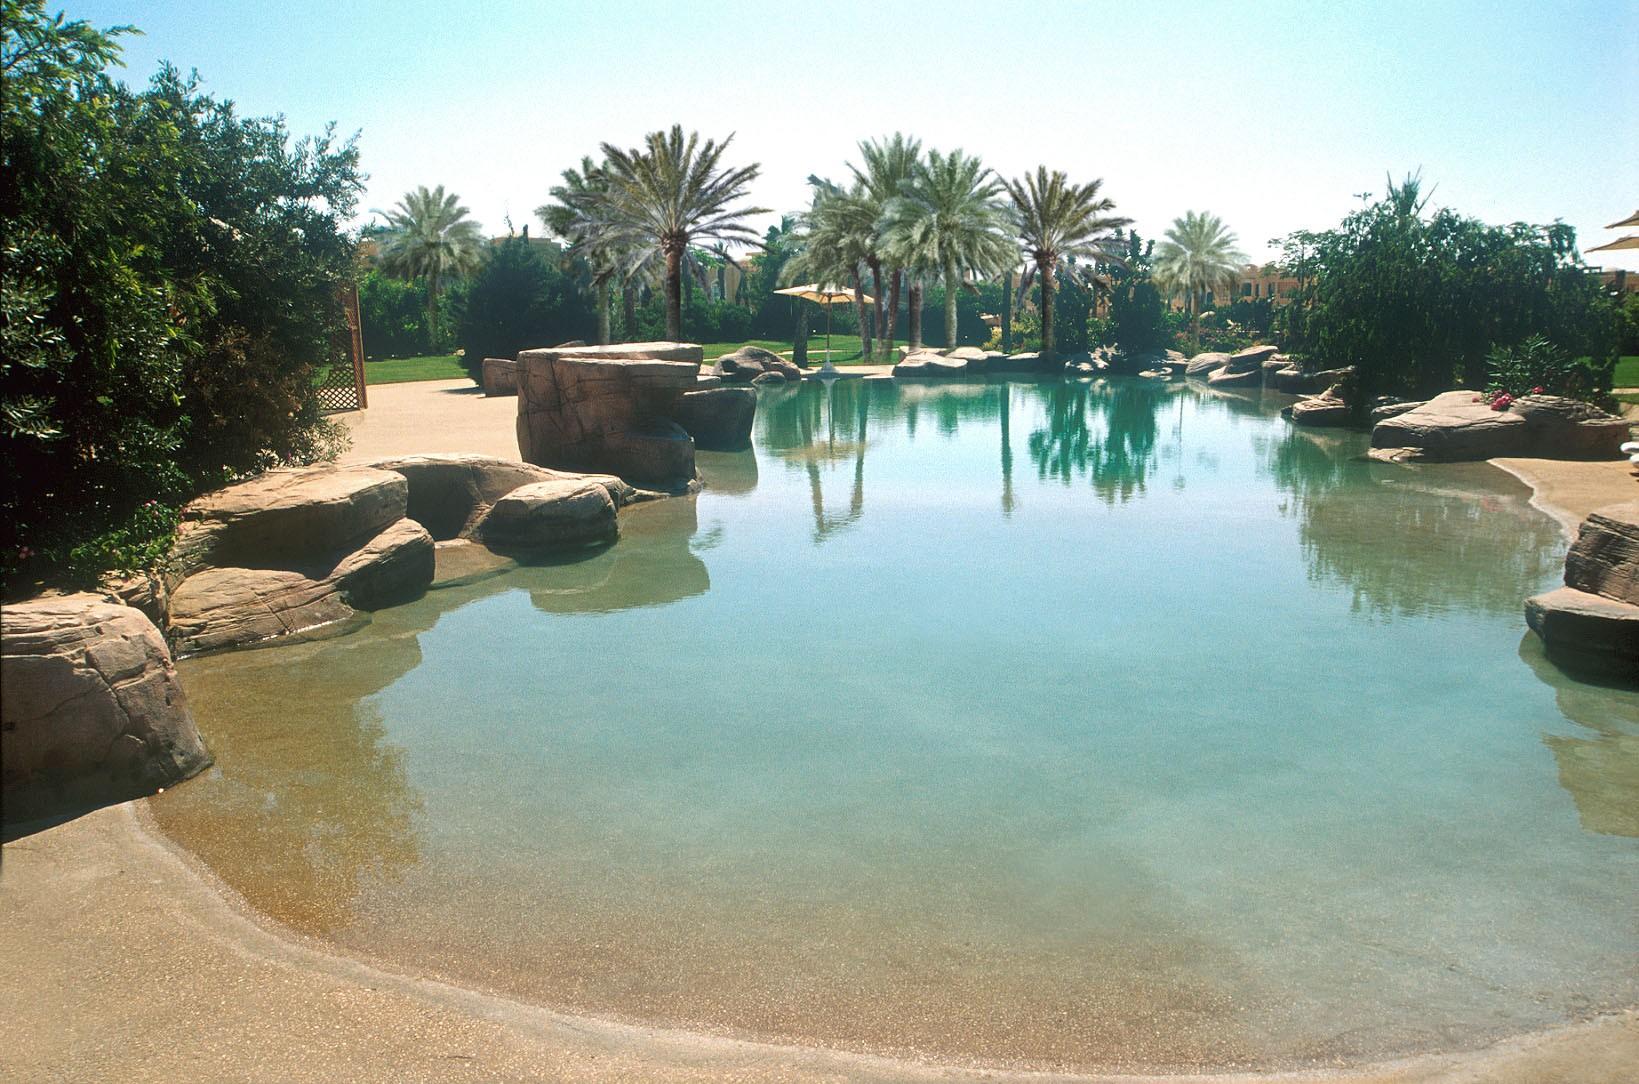 A small corner of the Ocean - حمامات السباحة